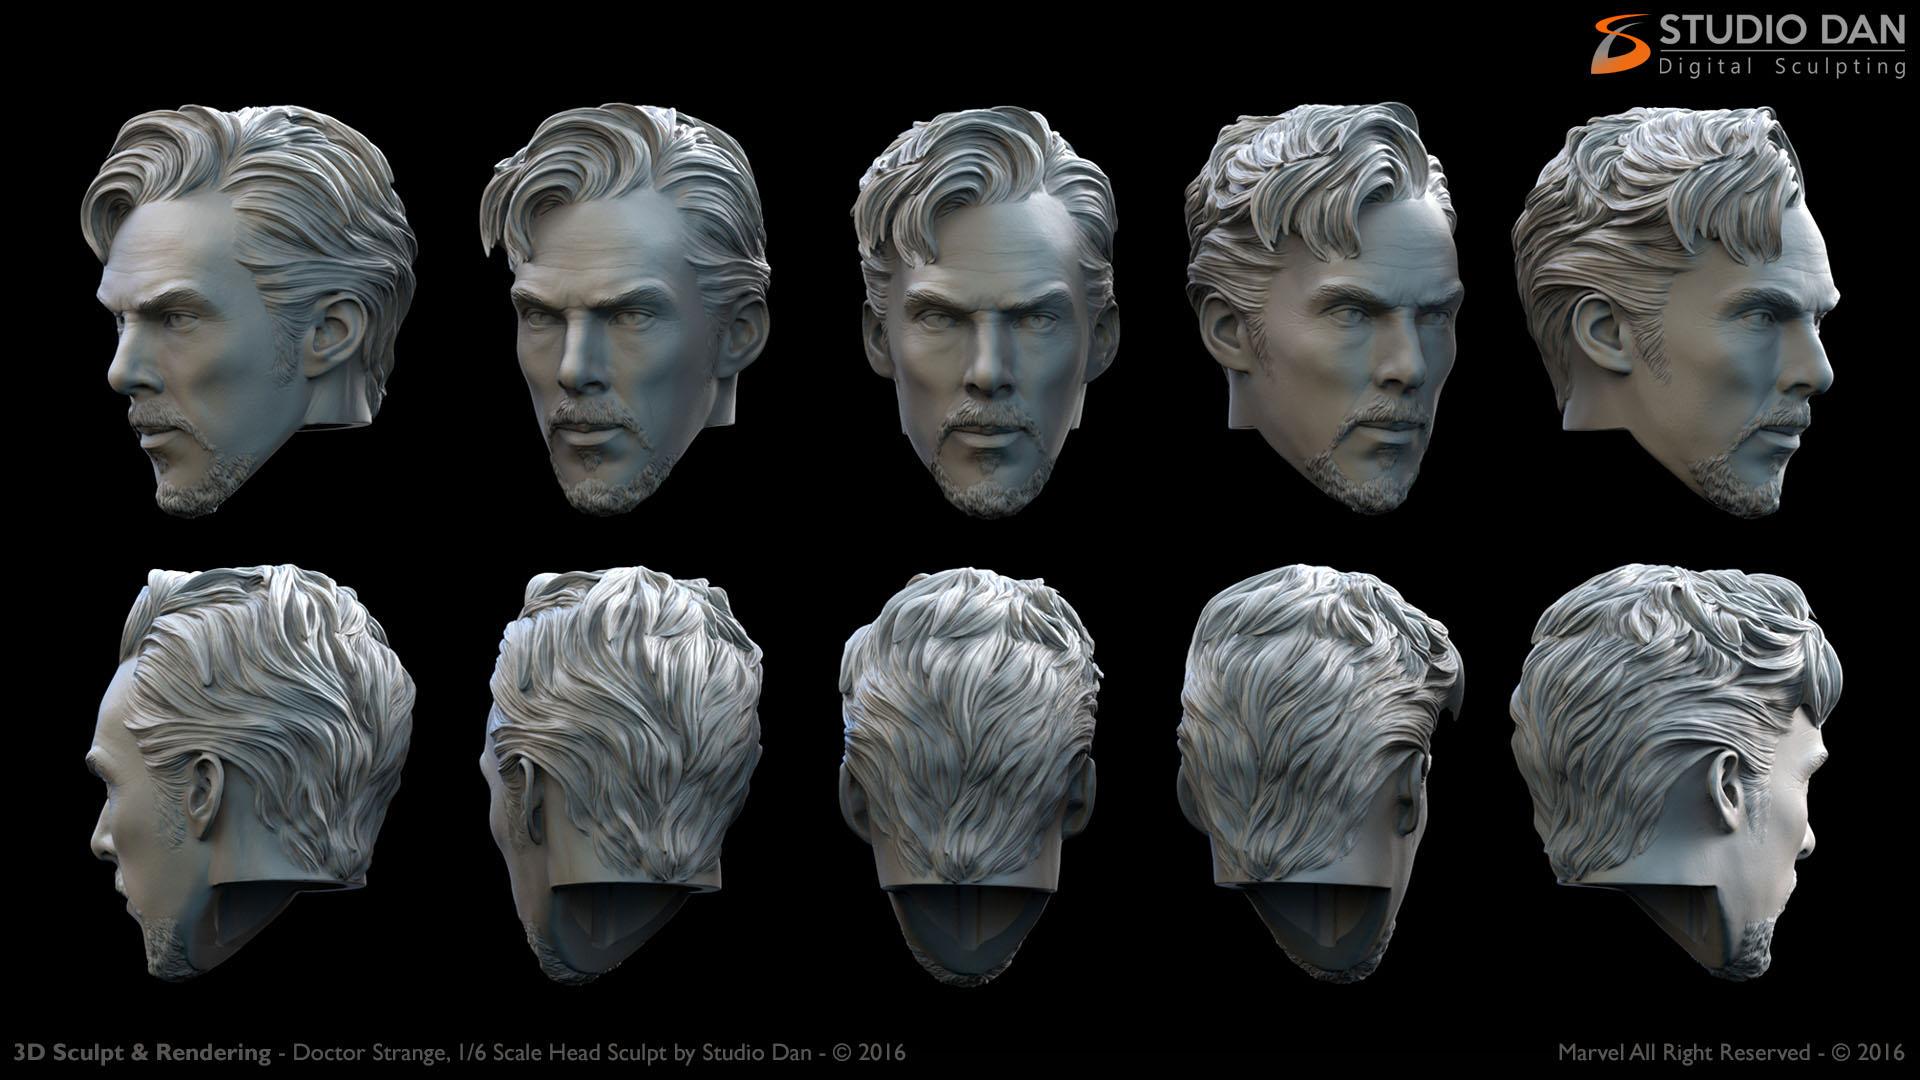 3D Head Sculpt 1/6 th scale Collectible Figure